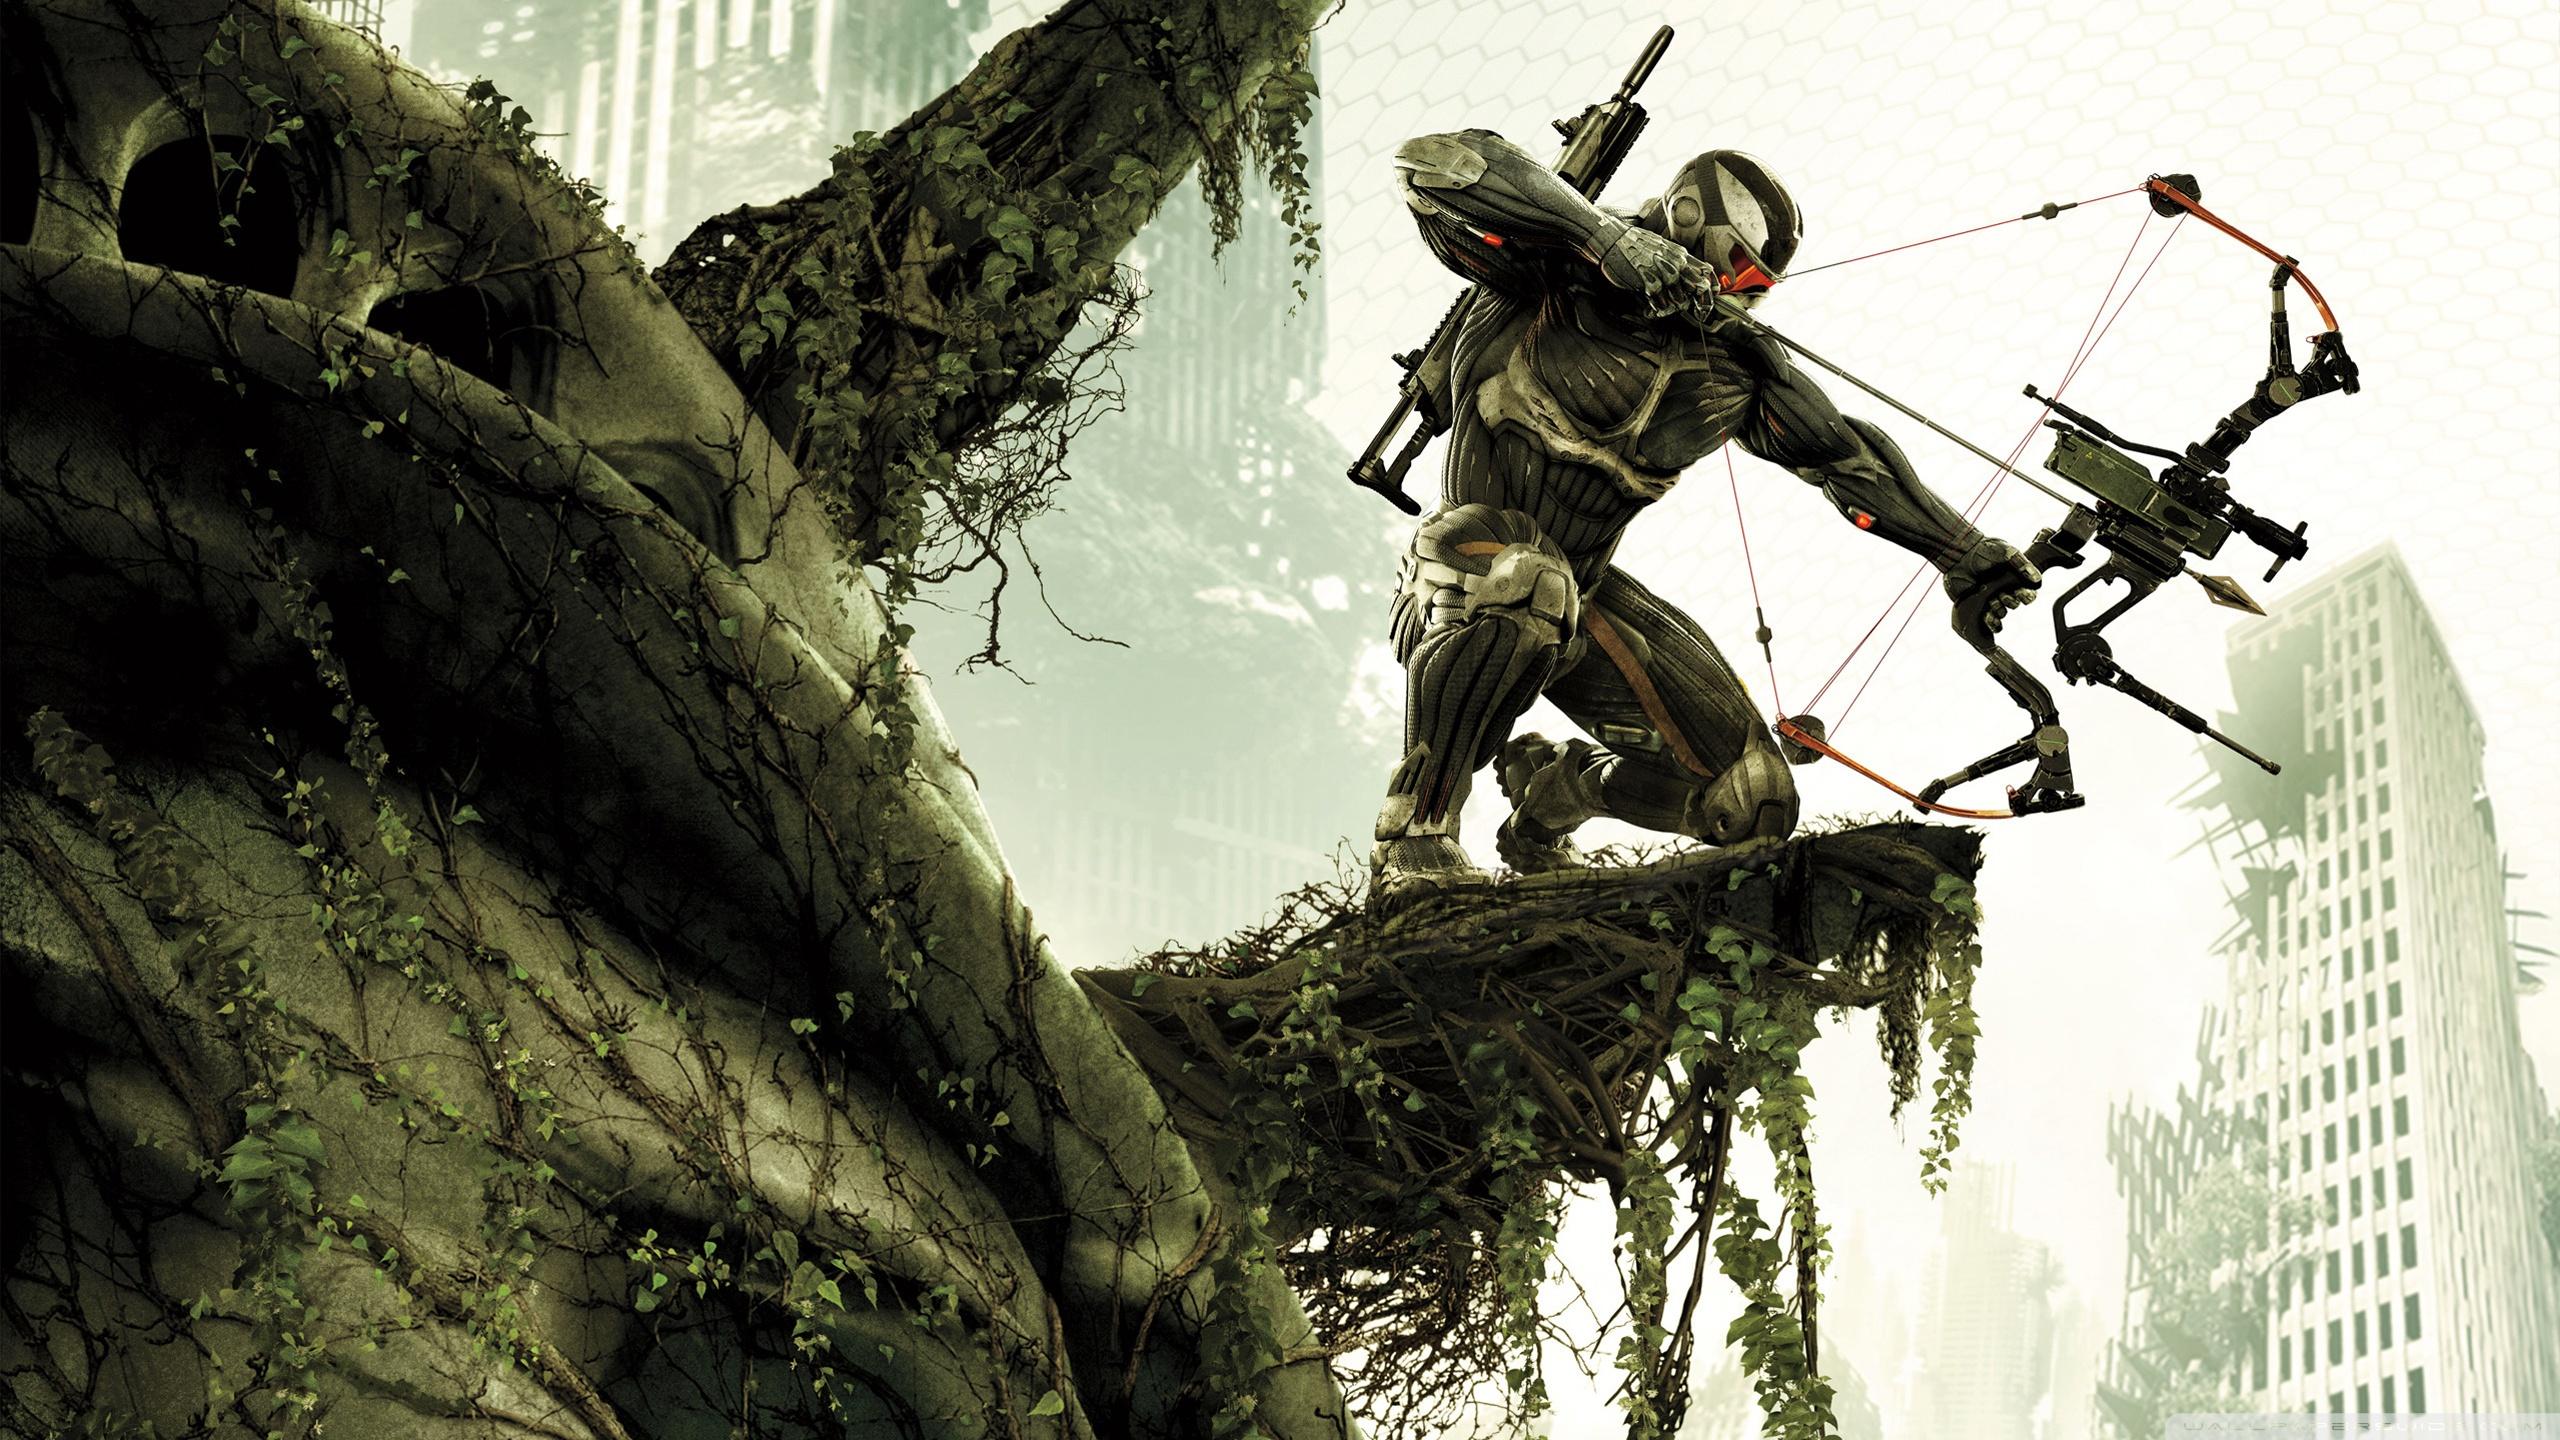 Crysis 3 - GamePlay #1 FULL HD - YouTube